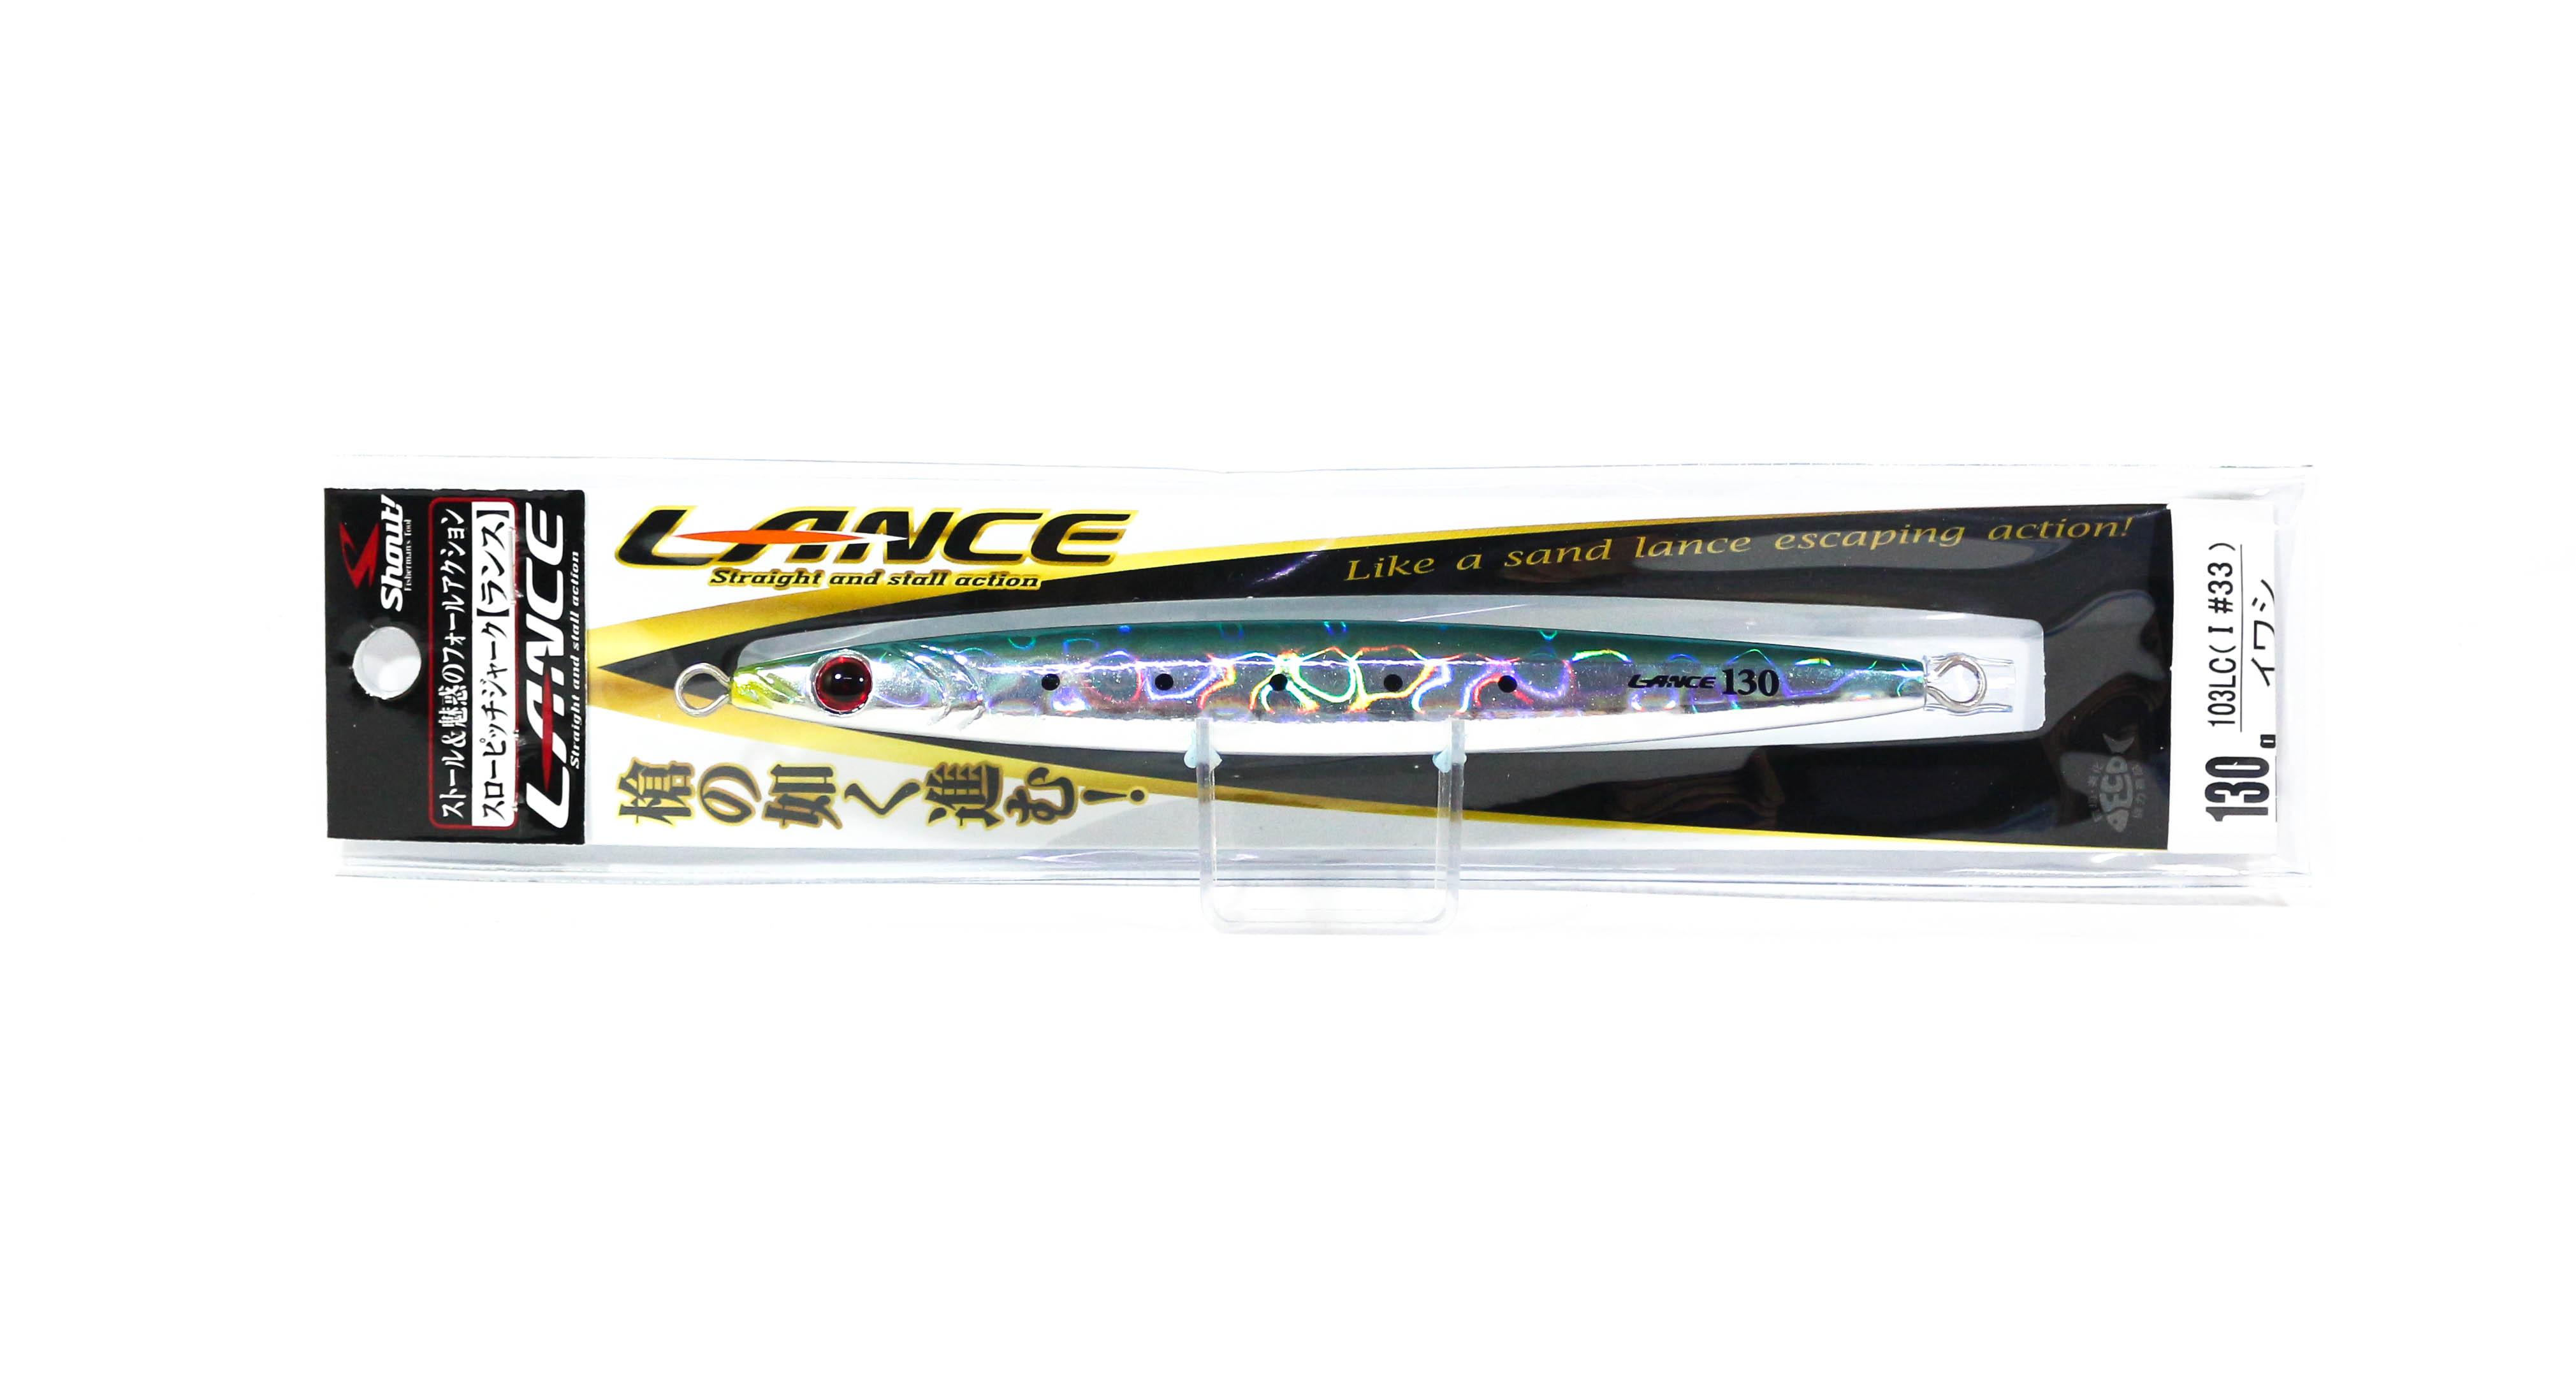 Shout 103-LC Metal Jig Lance Slow Fall Long 130 grams I (7970)